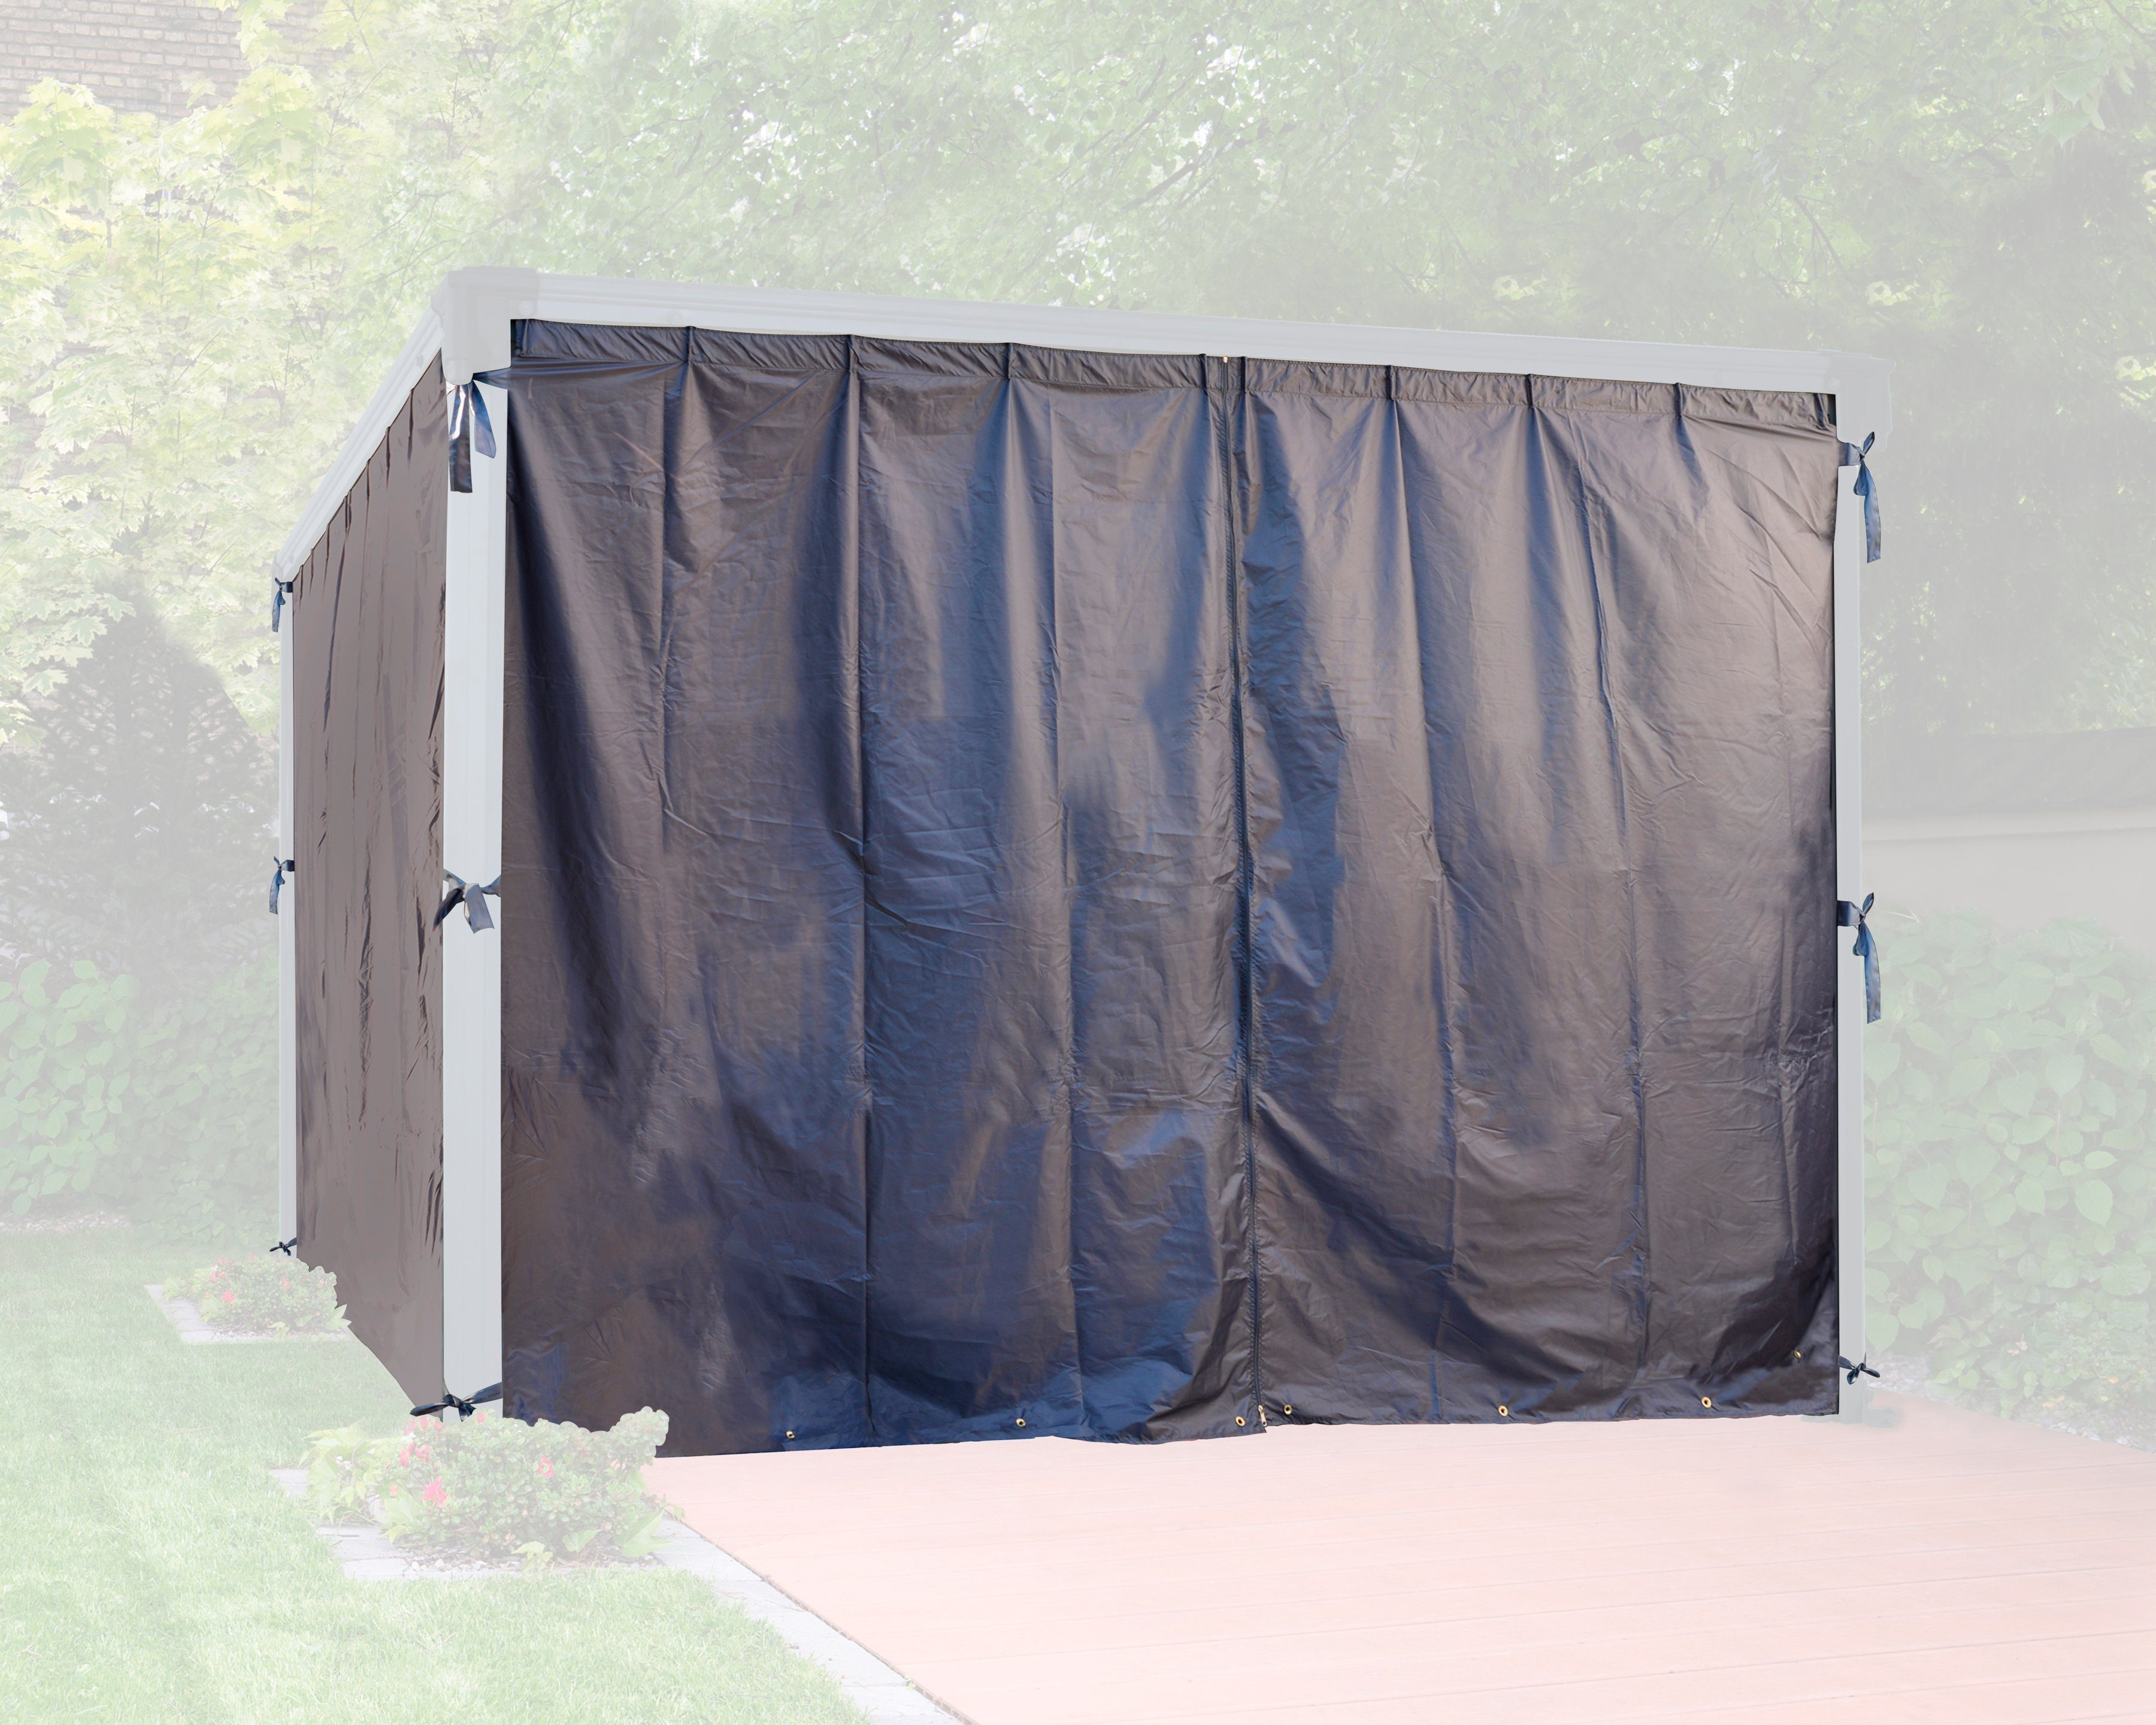 PALRAM Seitenteile für Pavillon »Milano«, grau, 4 Stk.